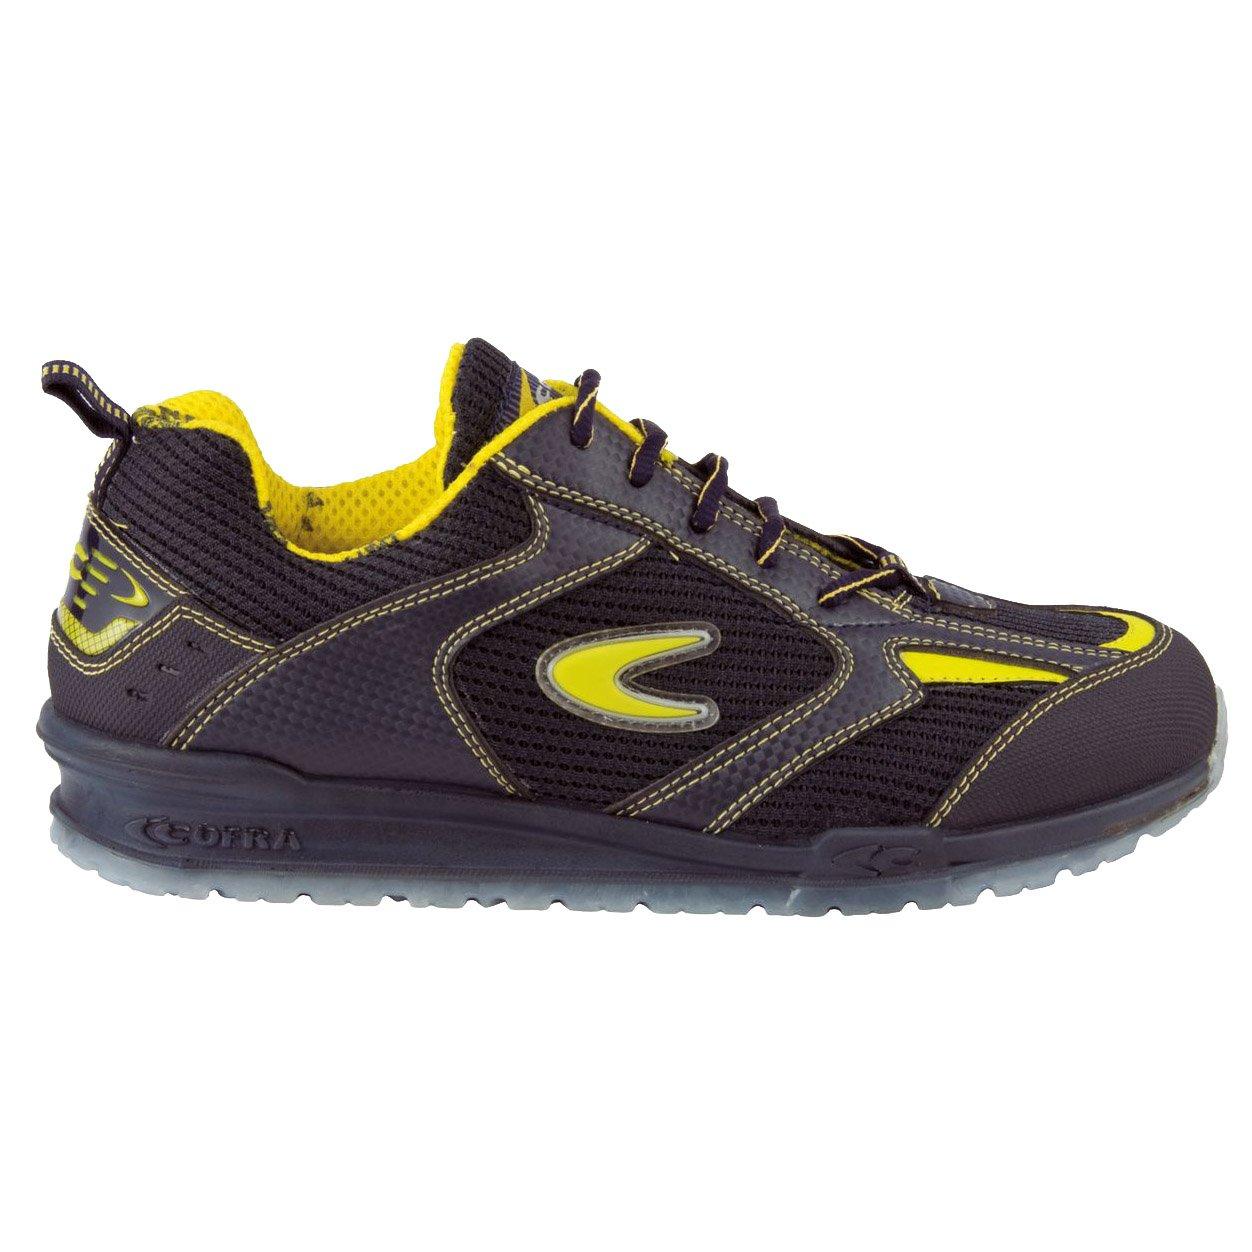 Zapatos de Seguridad, de la Marca Cofra, Modelo Bartali, 78480-000 W43, tamañ o 43 O1 SRC FO, Color Negro/Amarillo tamaño 43O1SRC FO 78480-000.W43